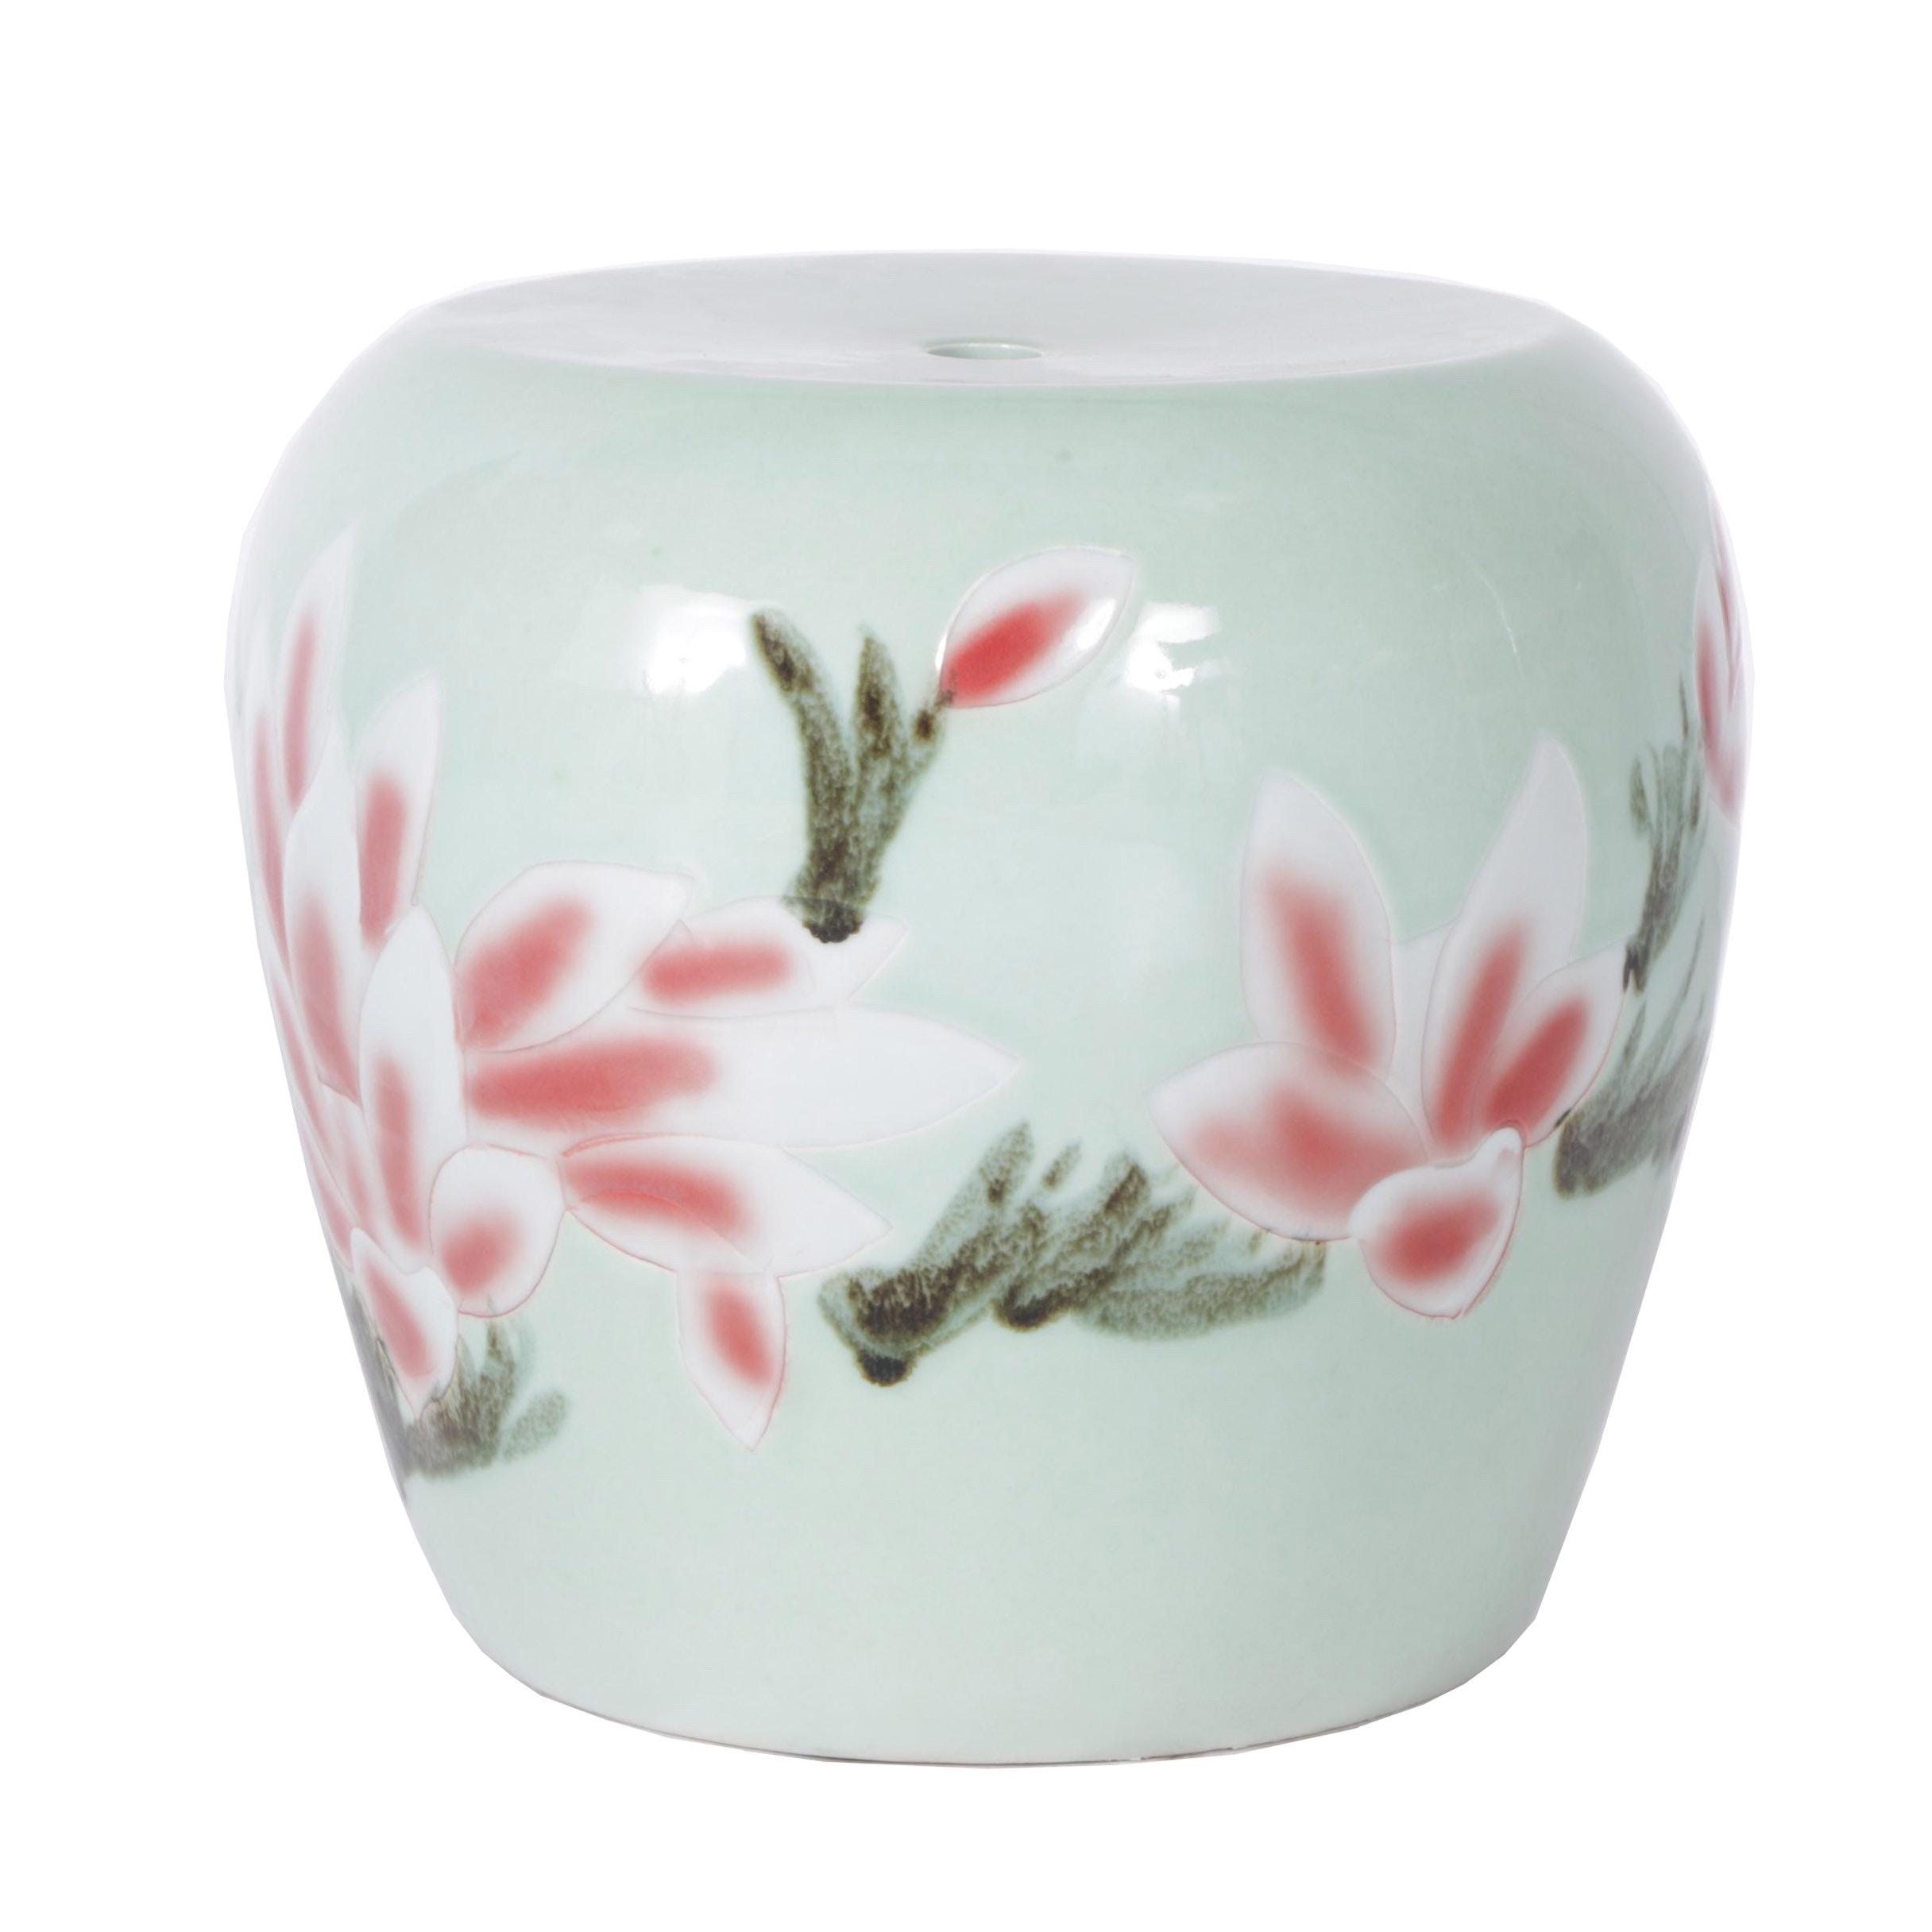 Chinese Light Green Ceramic Garden Stool with Magnolia Motif